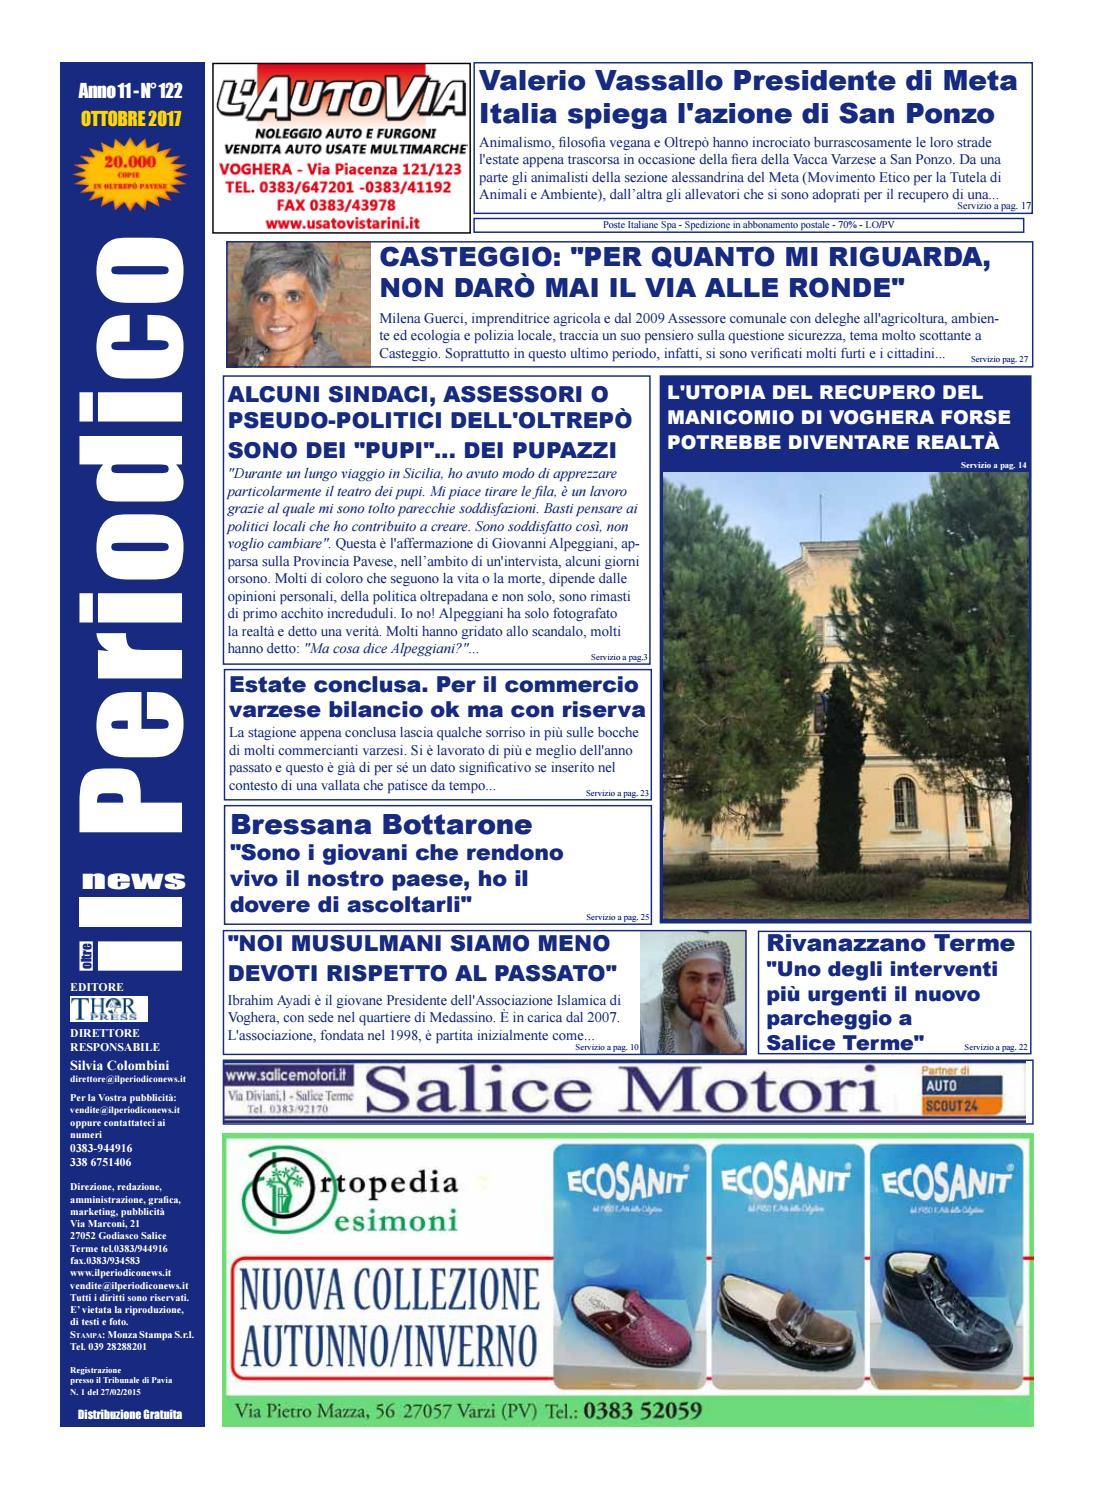 Il Periodico News - OTTOBRE 2017 N°122 by IlPeriodicoNews - issuu b0220642de5